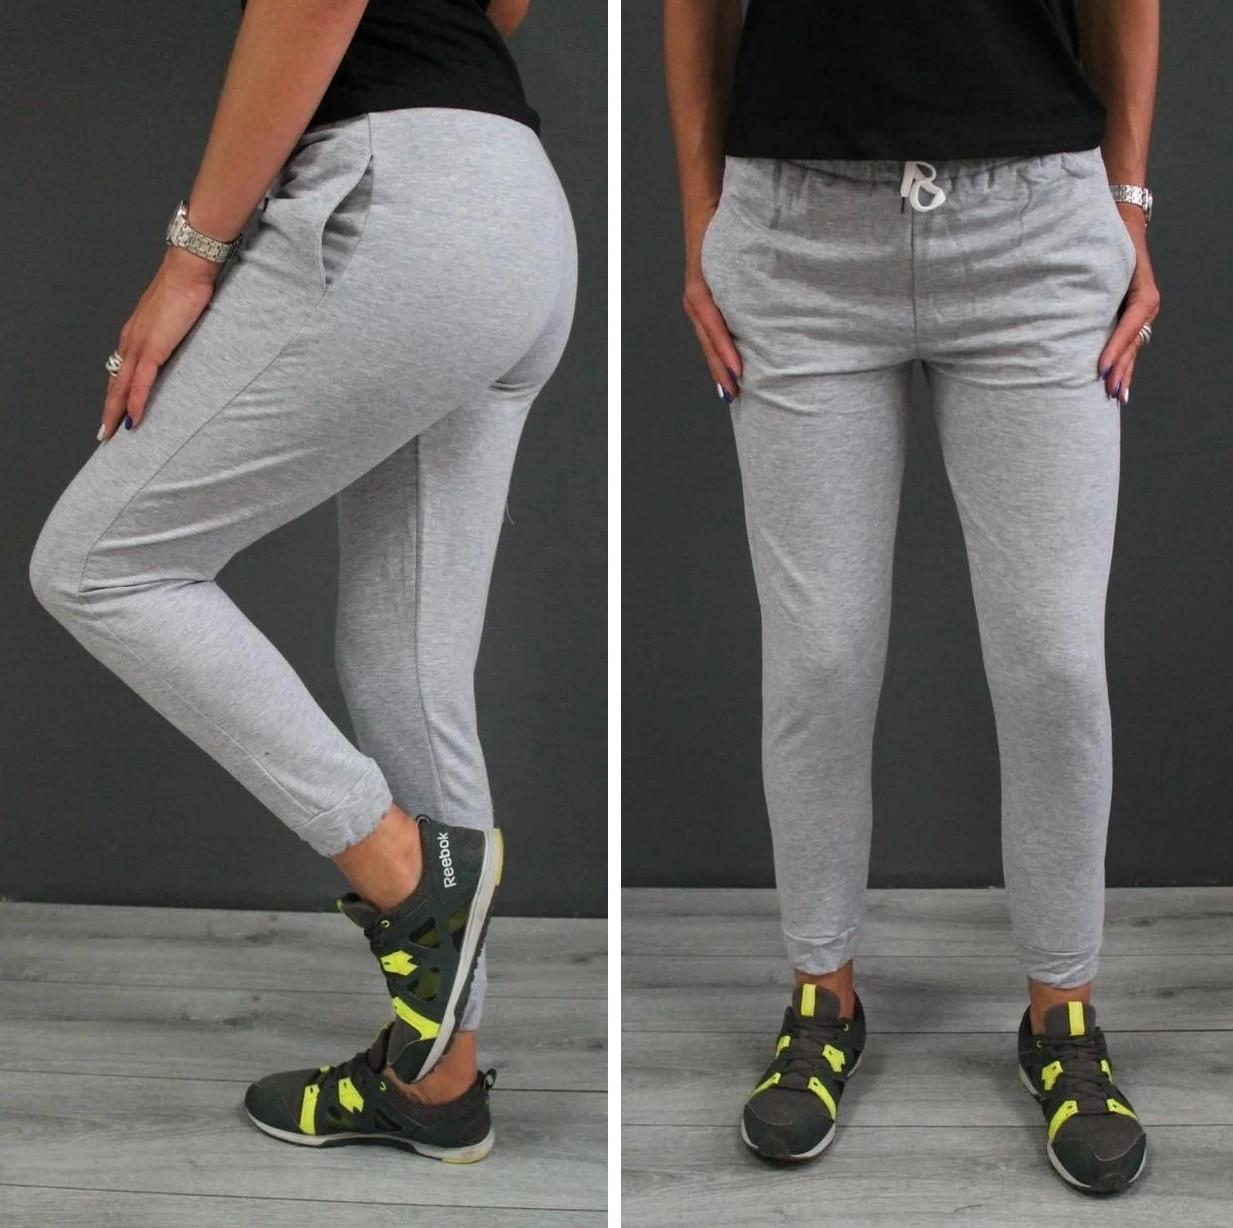 Спортивные штаны серые размер 42,44,46,48